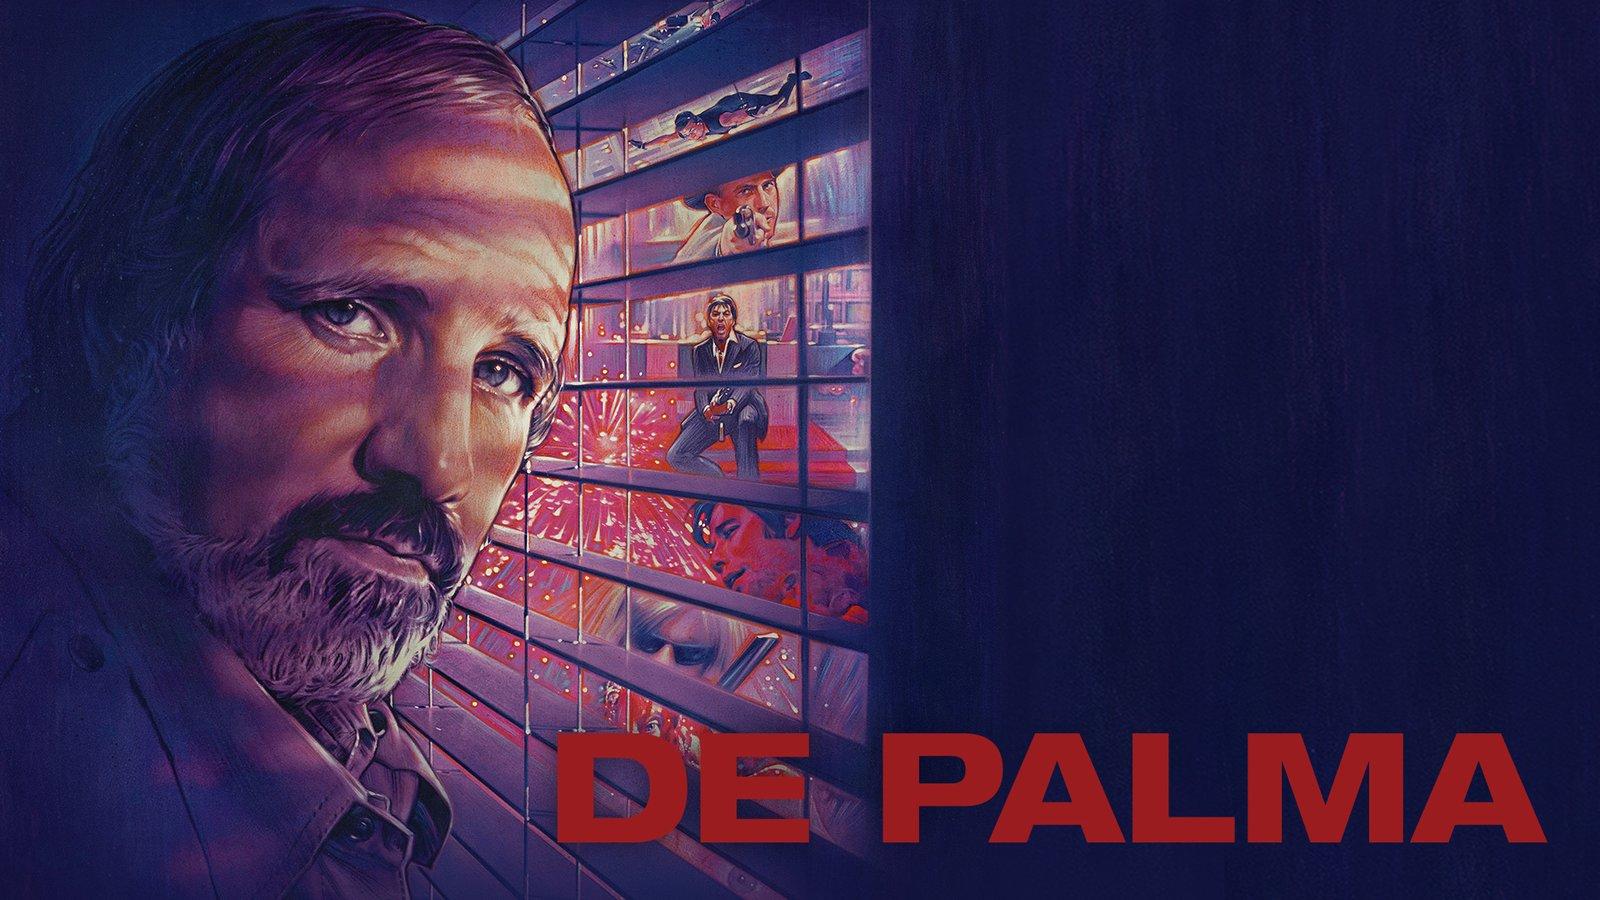 De Palma - The Work of Director and Screenwriter Brian De Palma